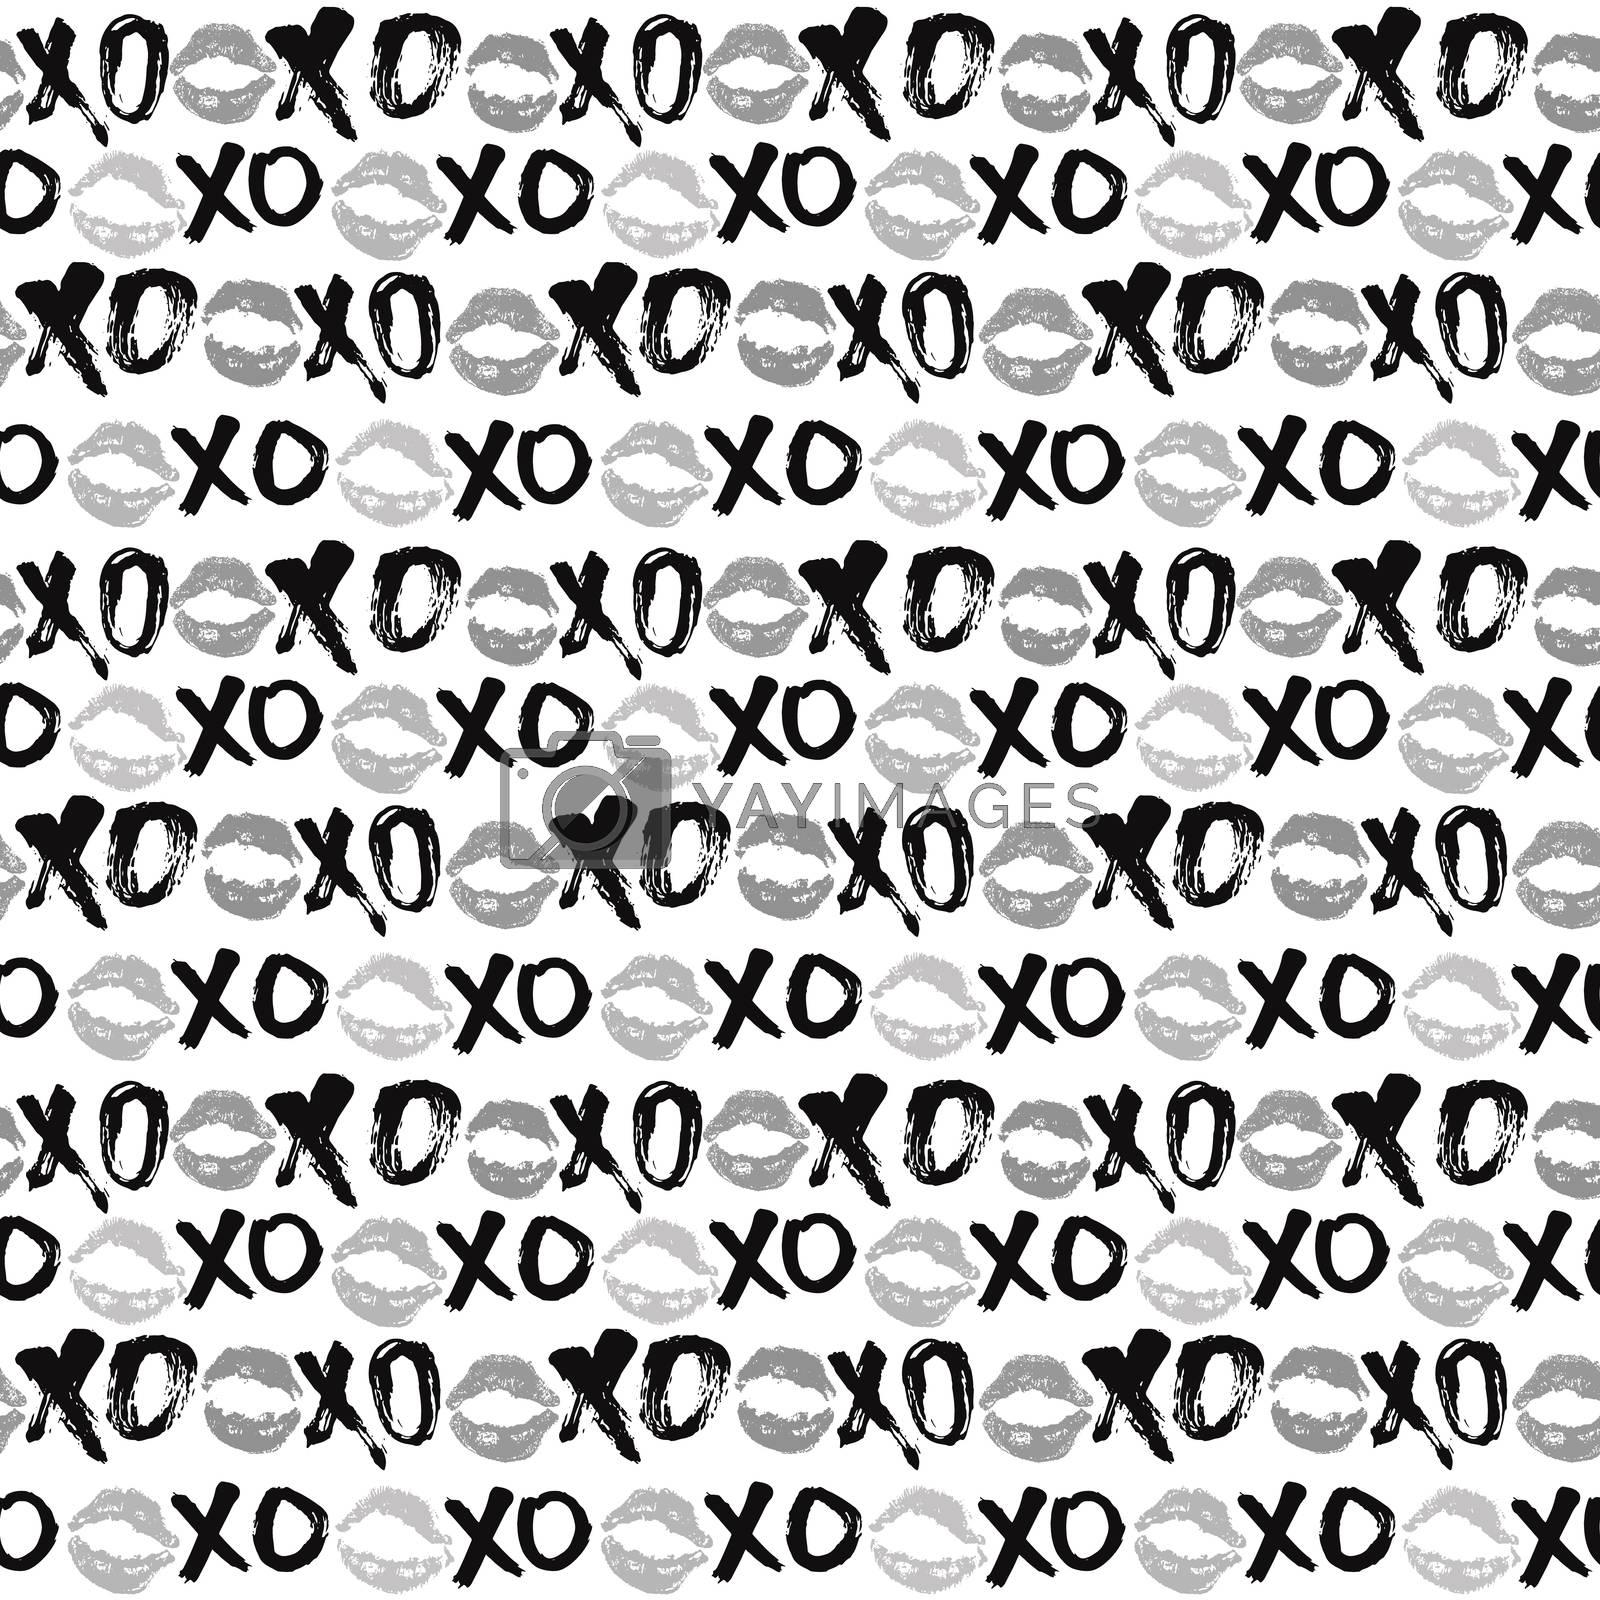 XOXO brush lettering signs seamless pattern, Grunge calligraphic hugs and kisses Phrase, Internet slang abbreviation XOXO symbols, vector illustration isolated on white background